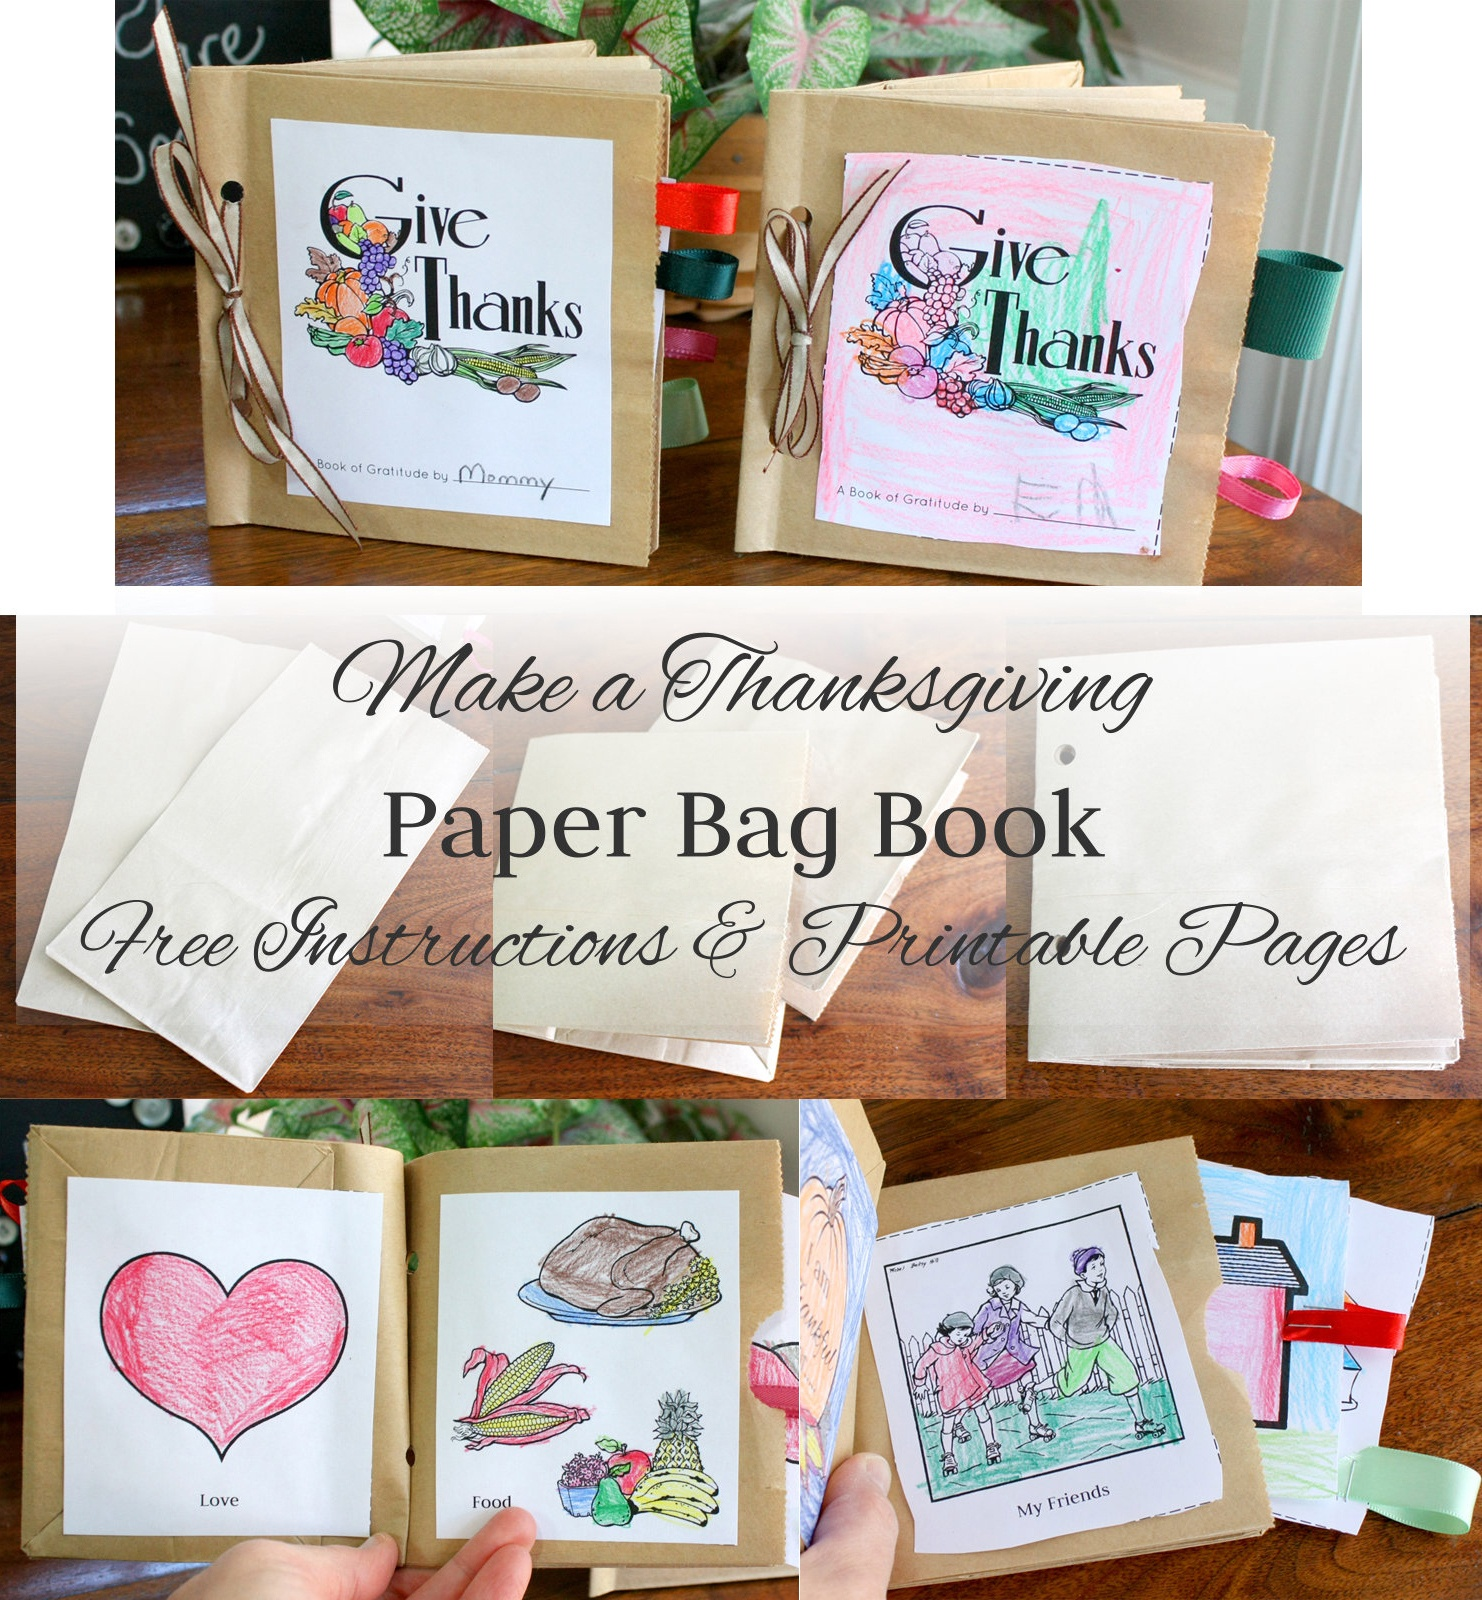 Make A Paper Bag Thanksgiving Book ~ Instructions And Free Printable - Free Printable Thanksgiving Books